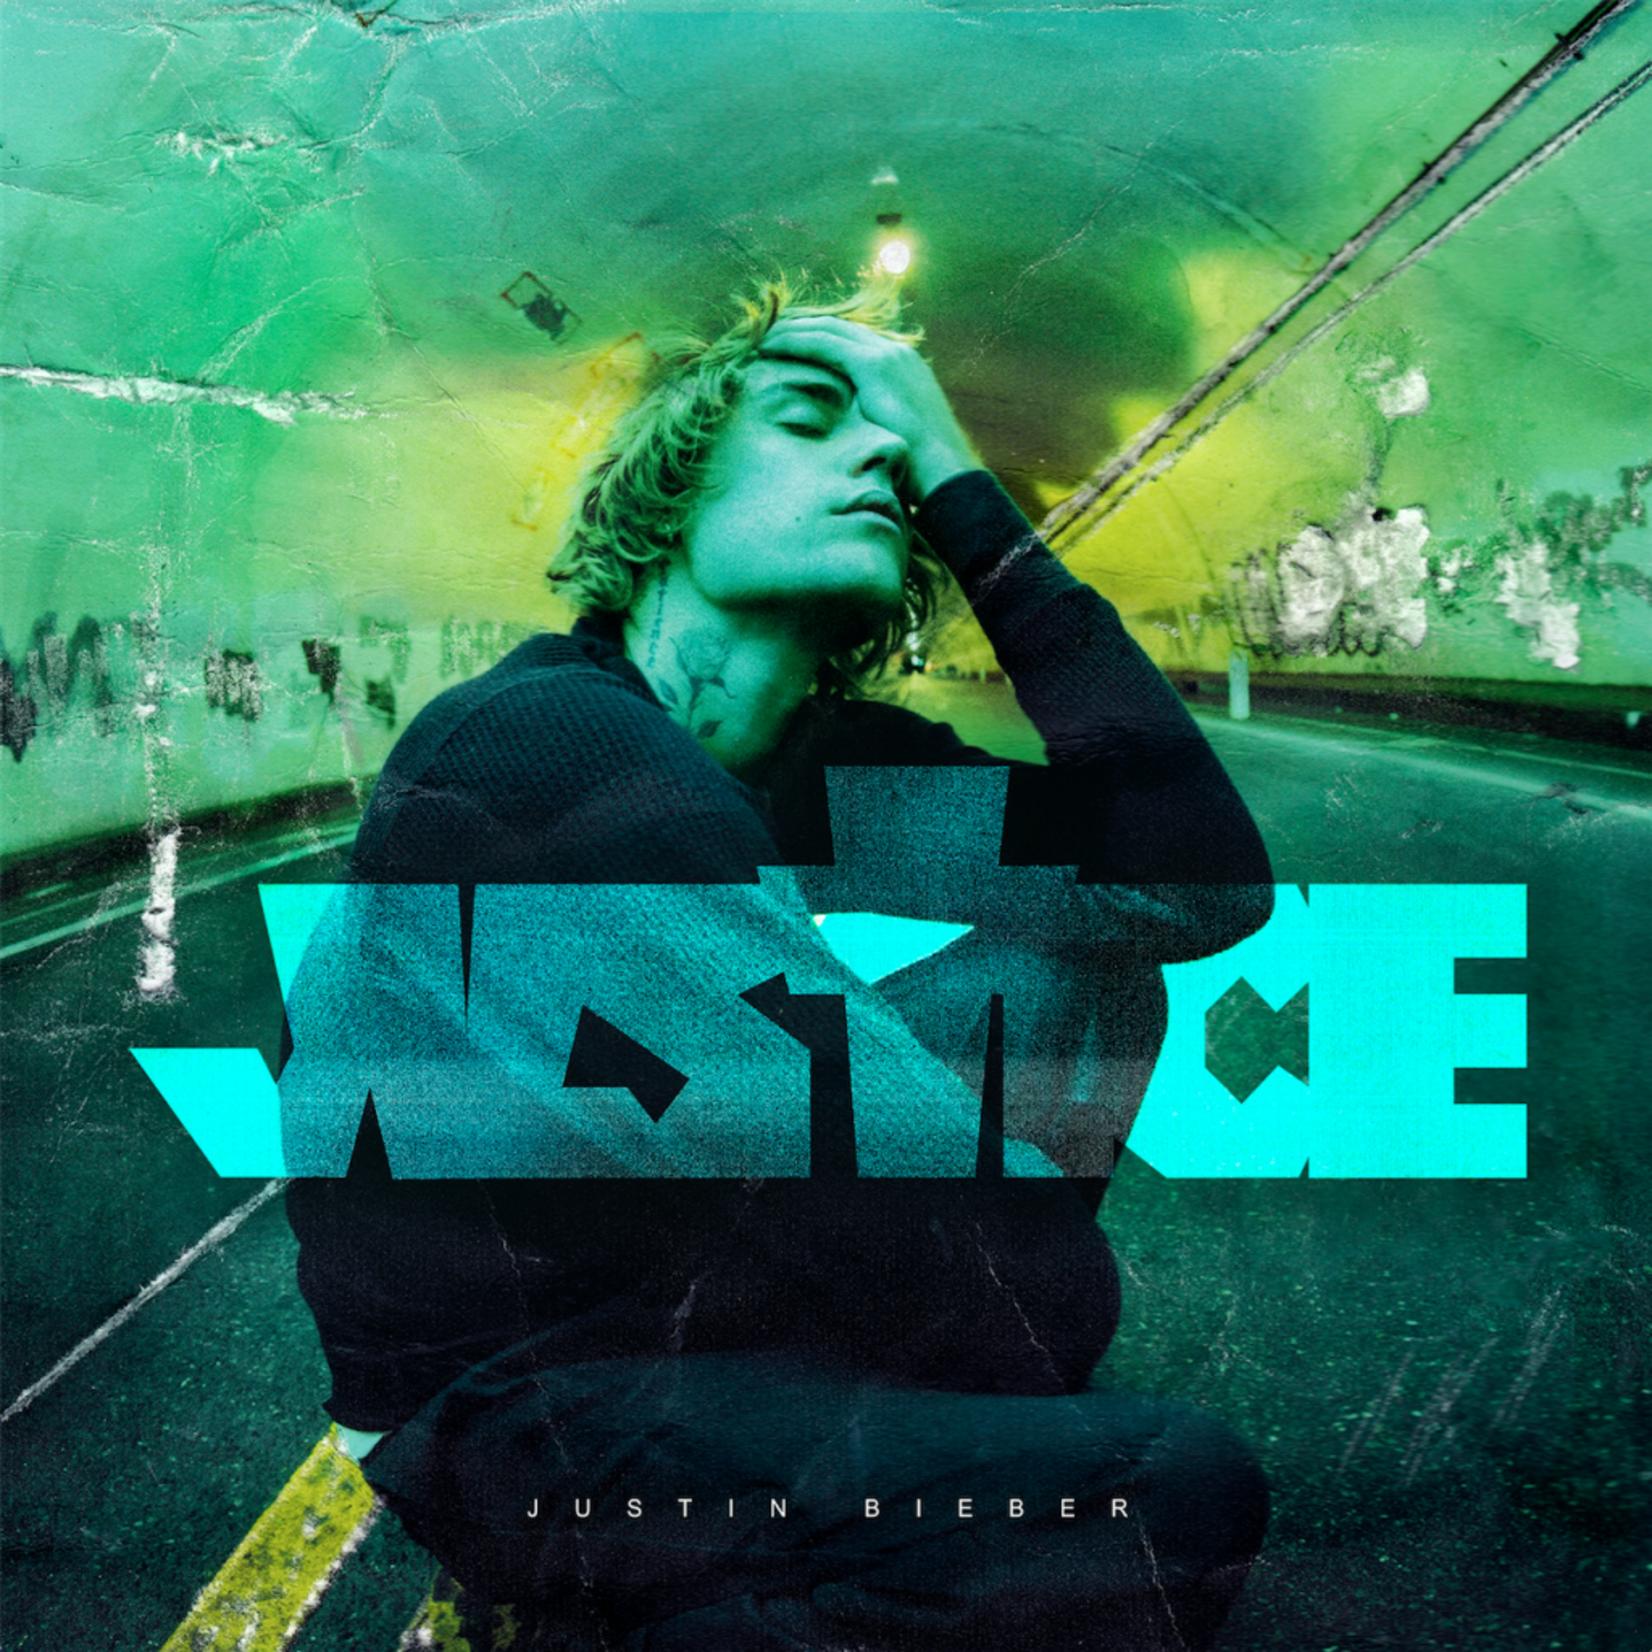 [New] Bieber, Justin: Justice